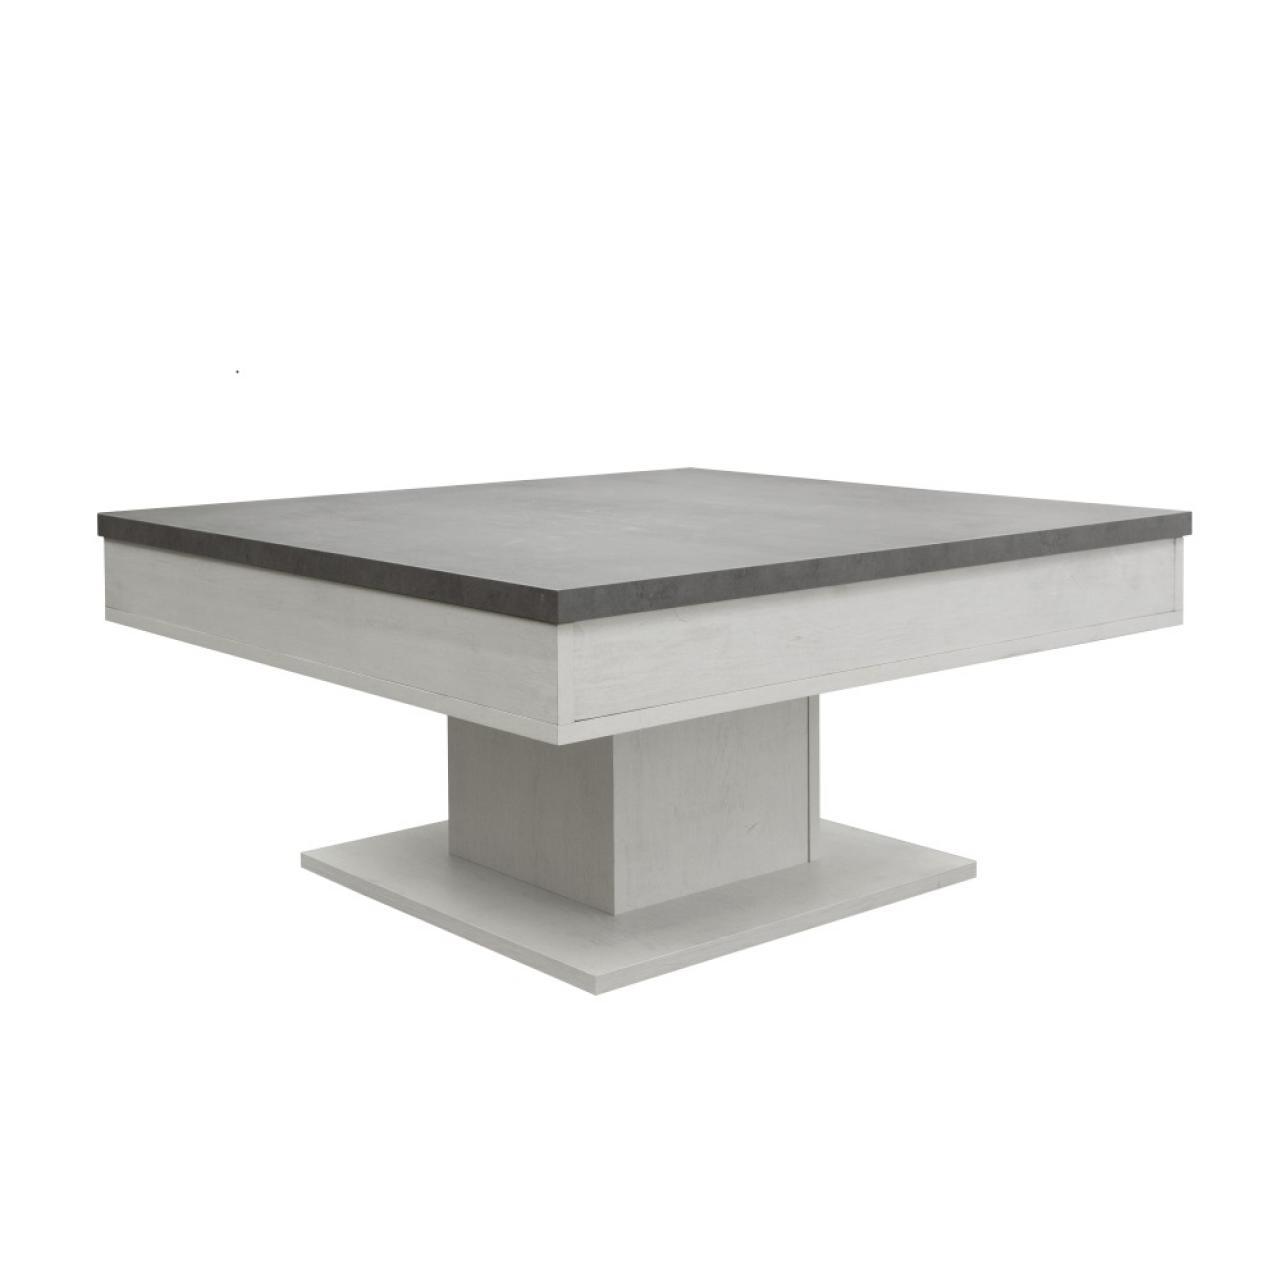 Sideboard  Landhausstil  weiß  Paulowniaholz